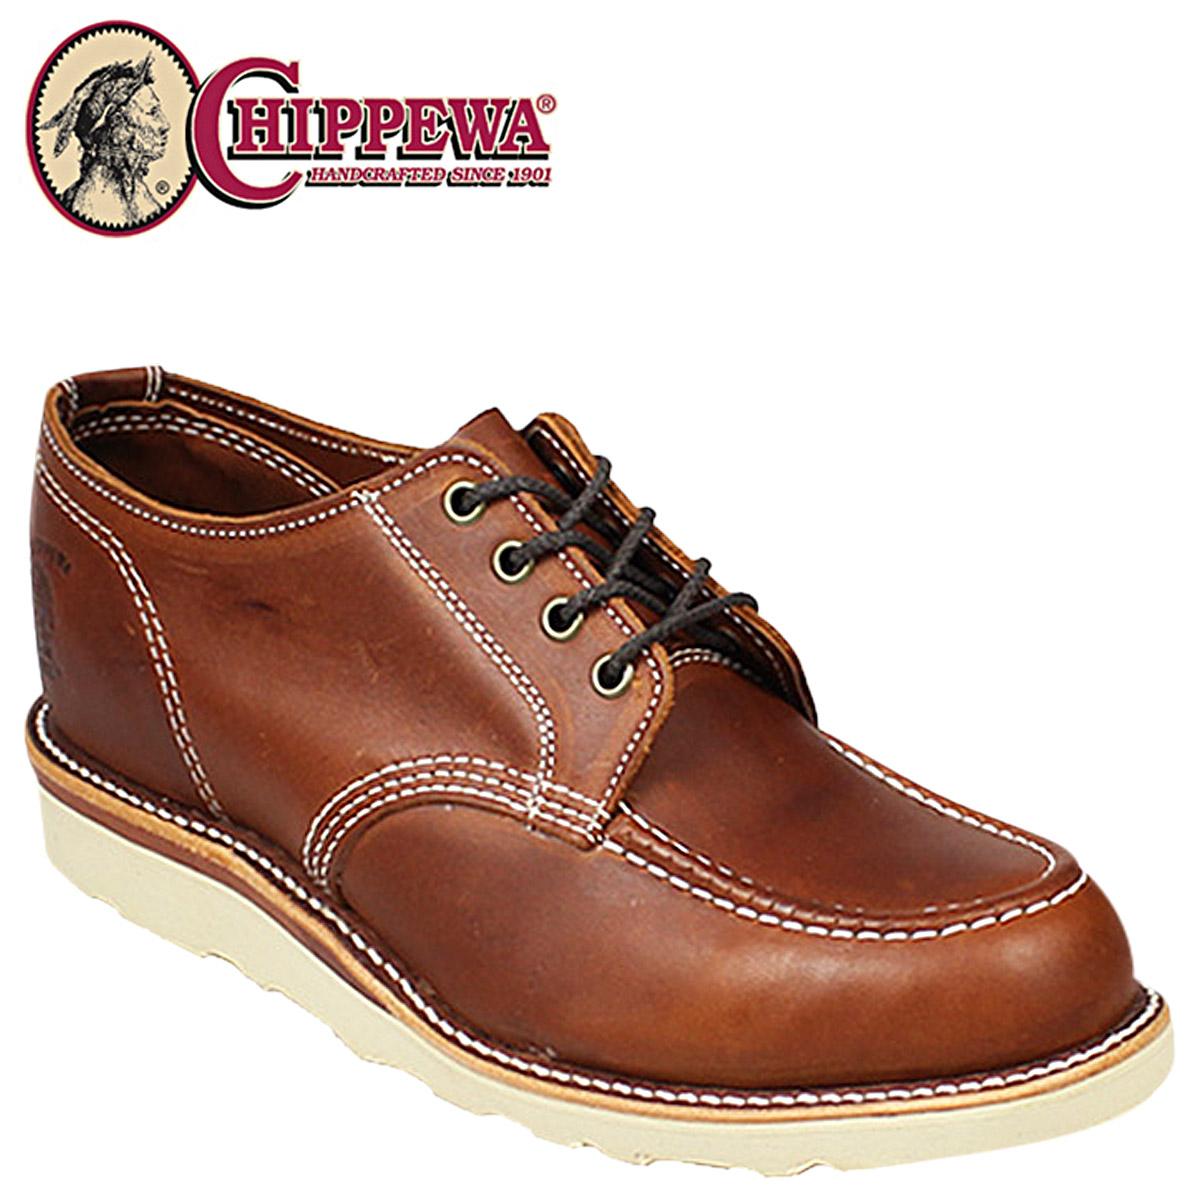 Allsports Sold Out Chippewa Chippewa Tan Moc To Shoes